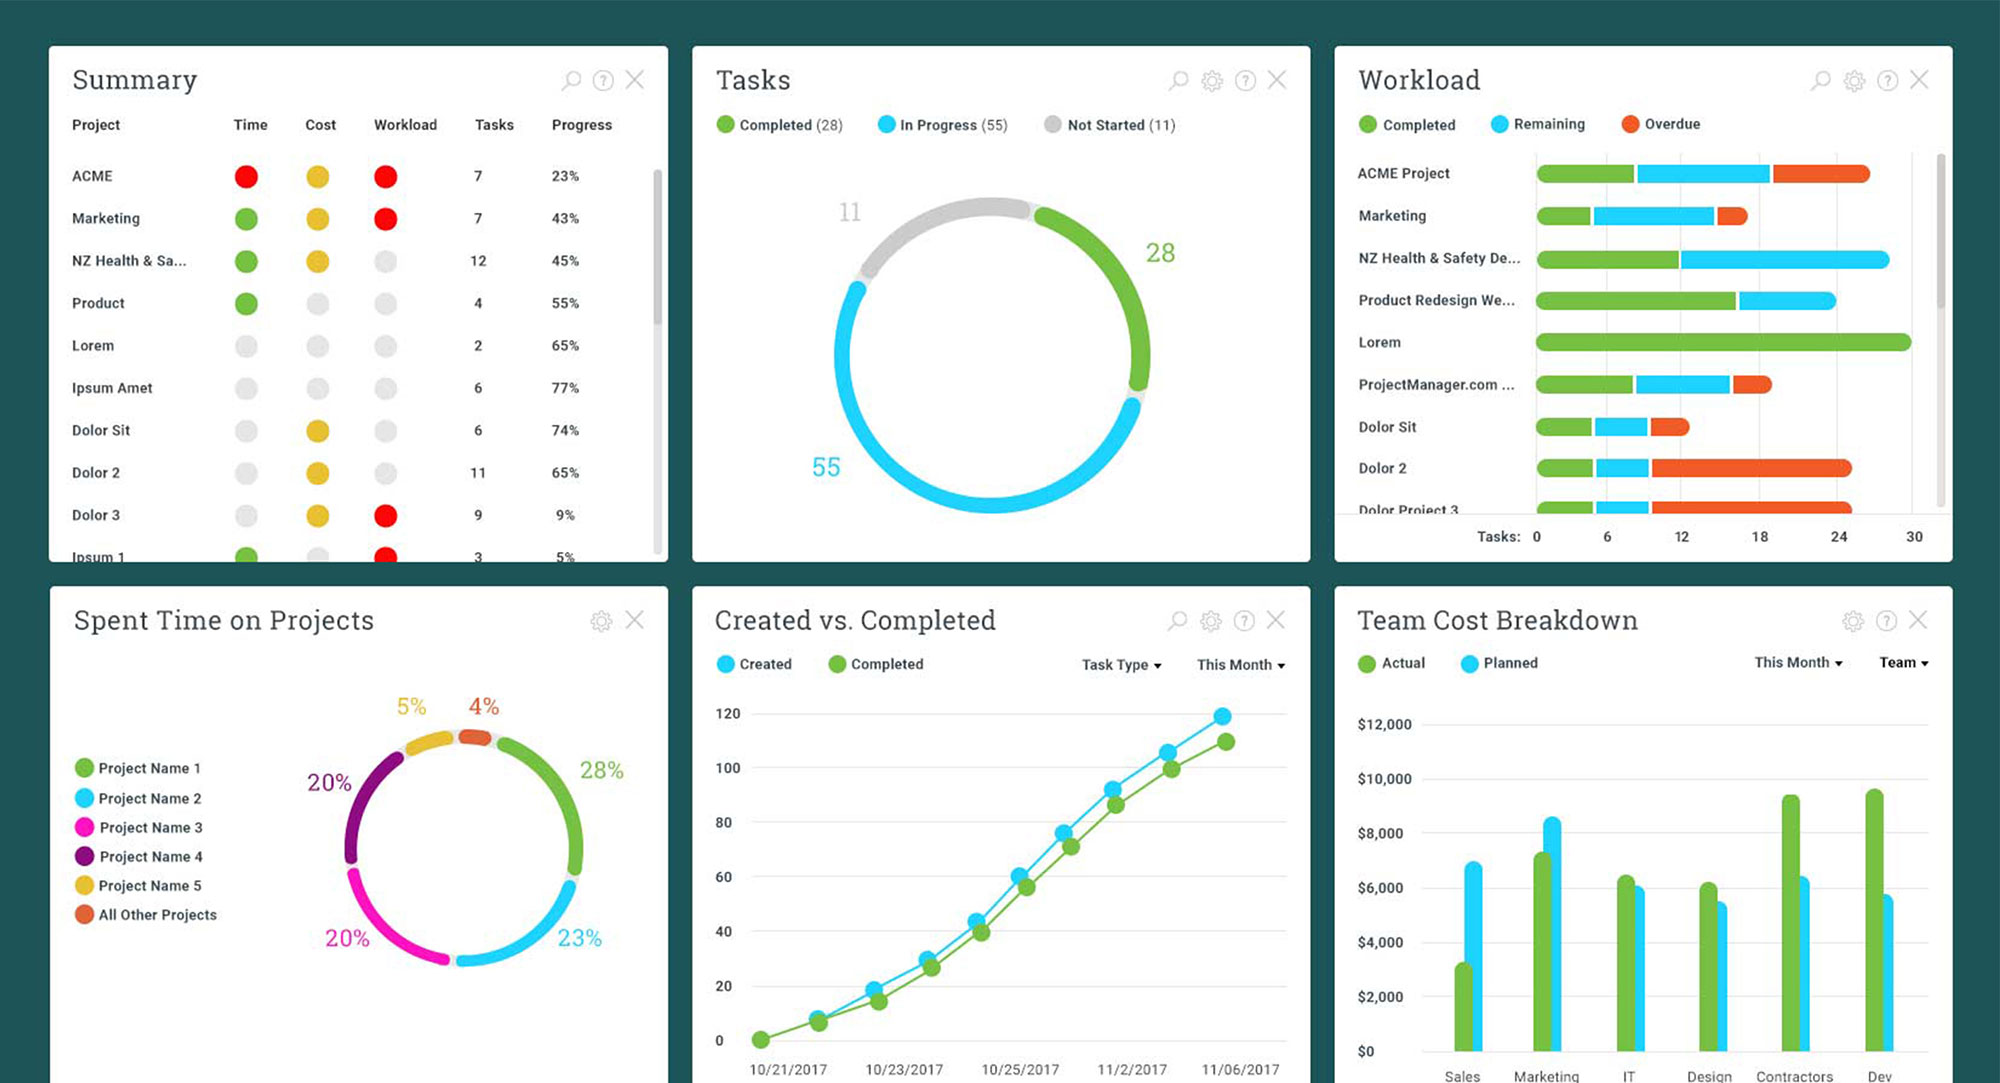 Software Development Life Cycle (SDLC) - ProjectManager.com